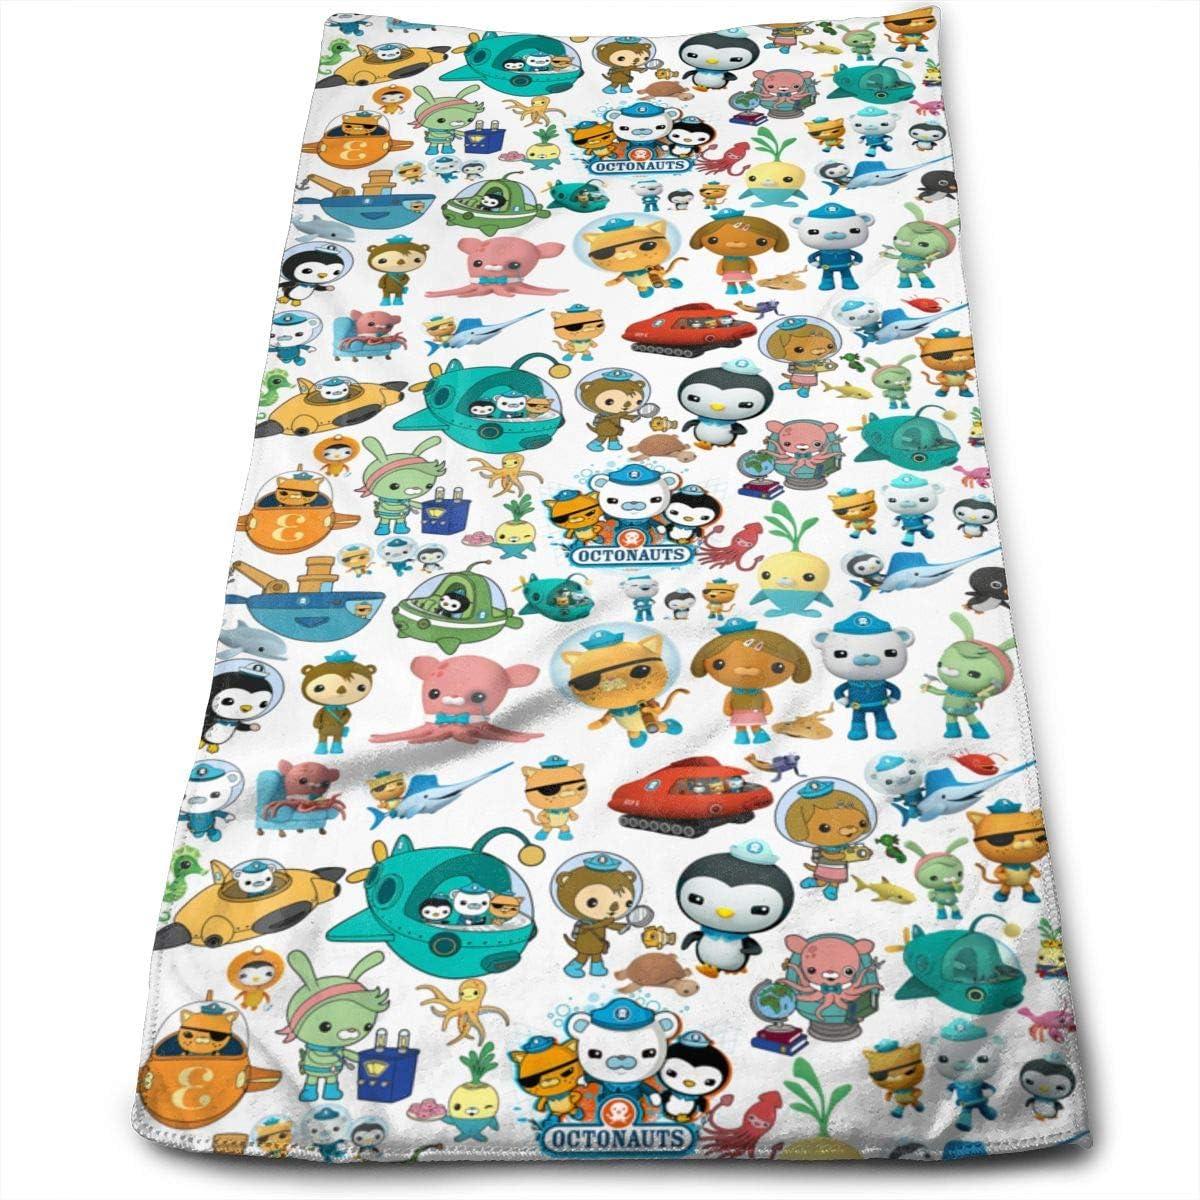 ASDDndPK Microfiber Sports The-Octonauts Towel for Swim Pool Beach Bathroom